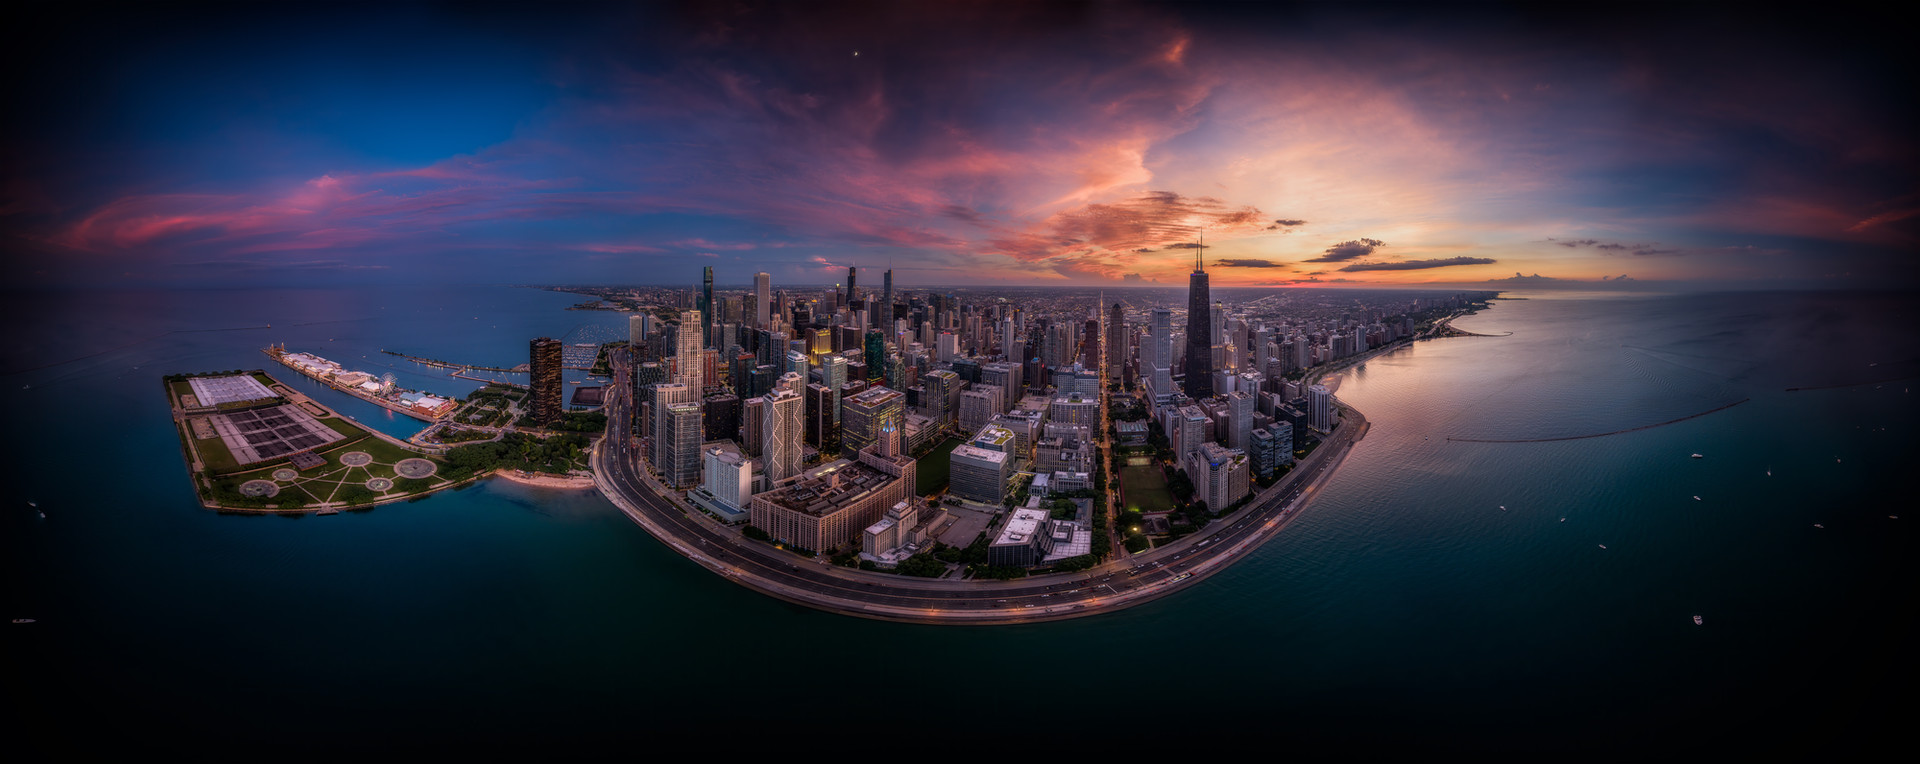 ChicagoDroneSaharaDustCloudSunset3602020